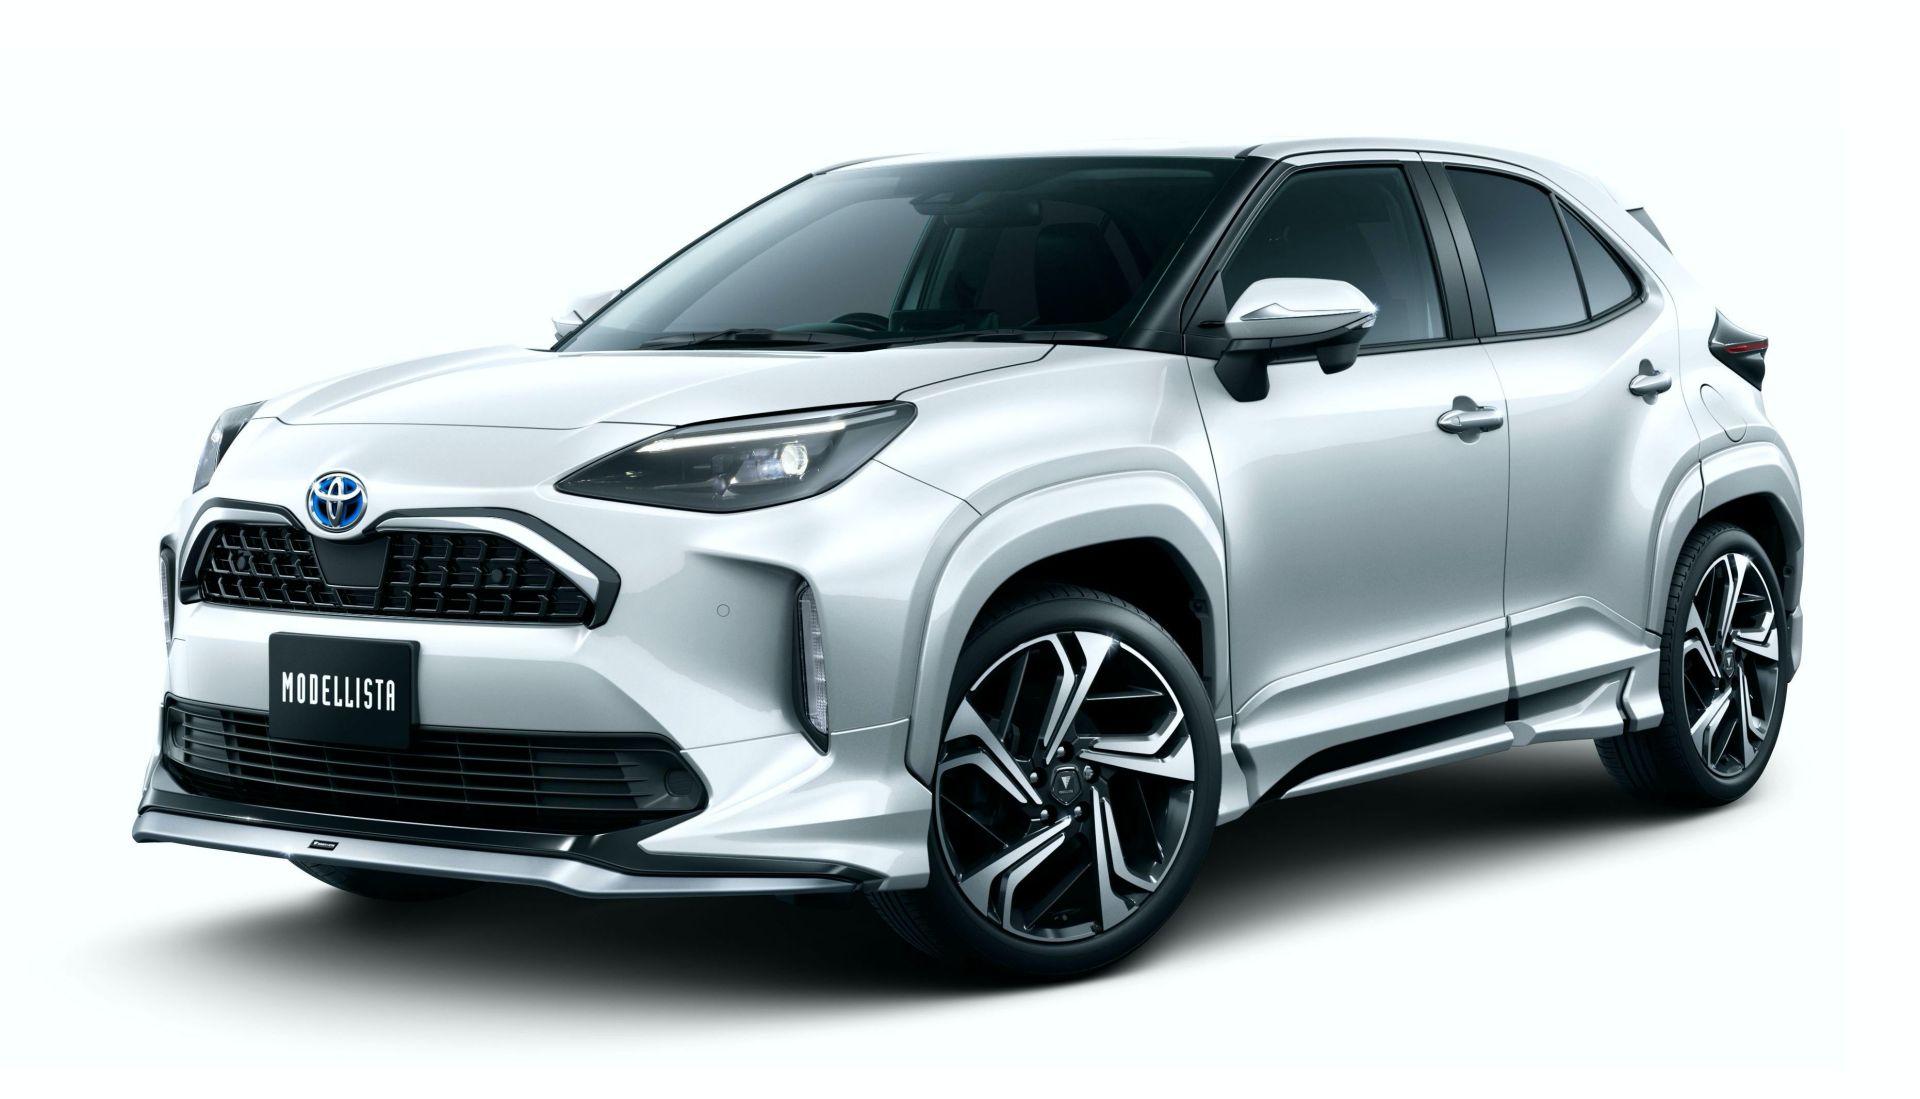 Toyota-Yaris-Cross-Gazoo-Racing-Modellista-parts-25